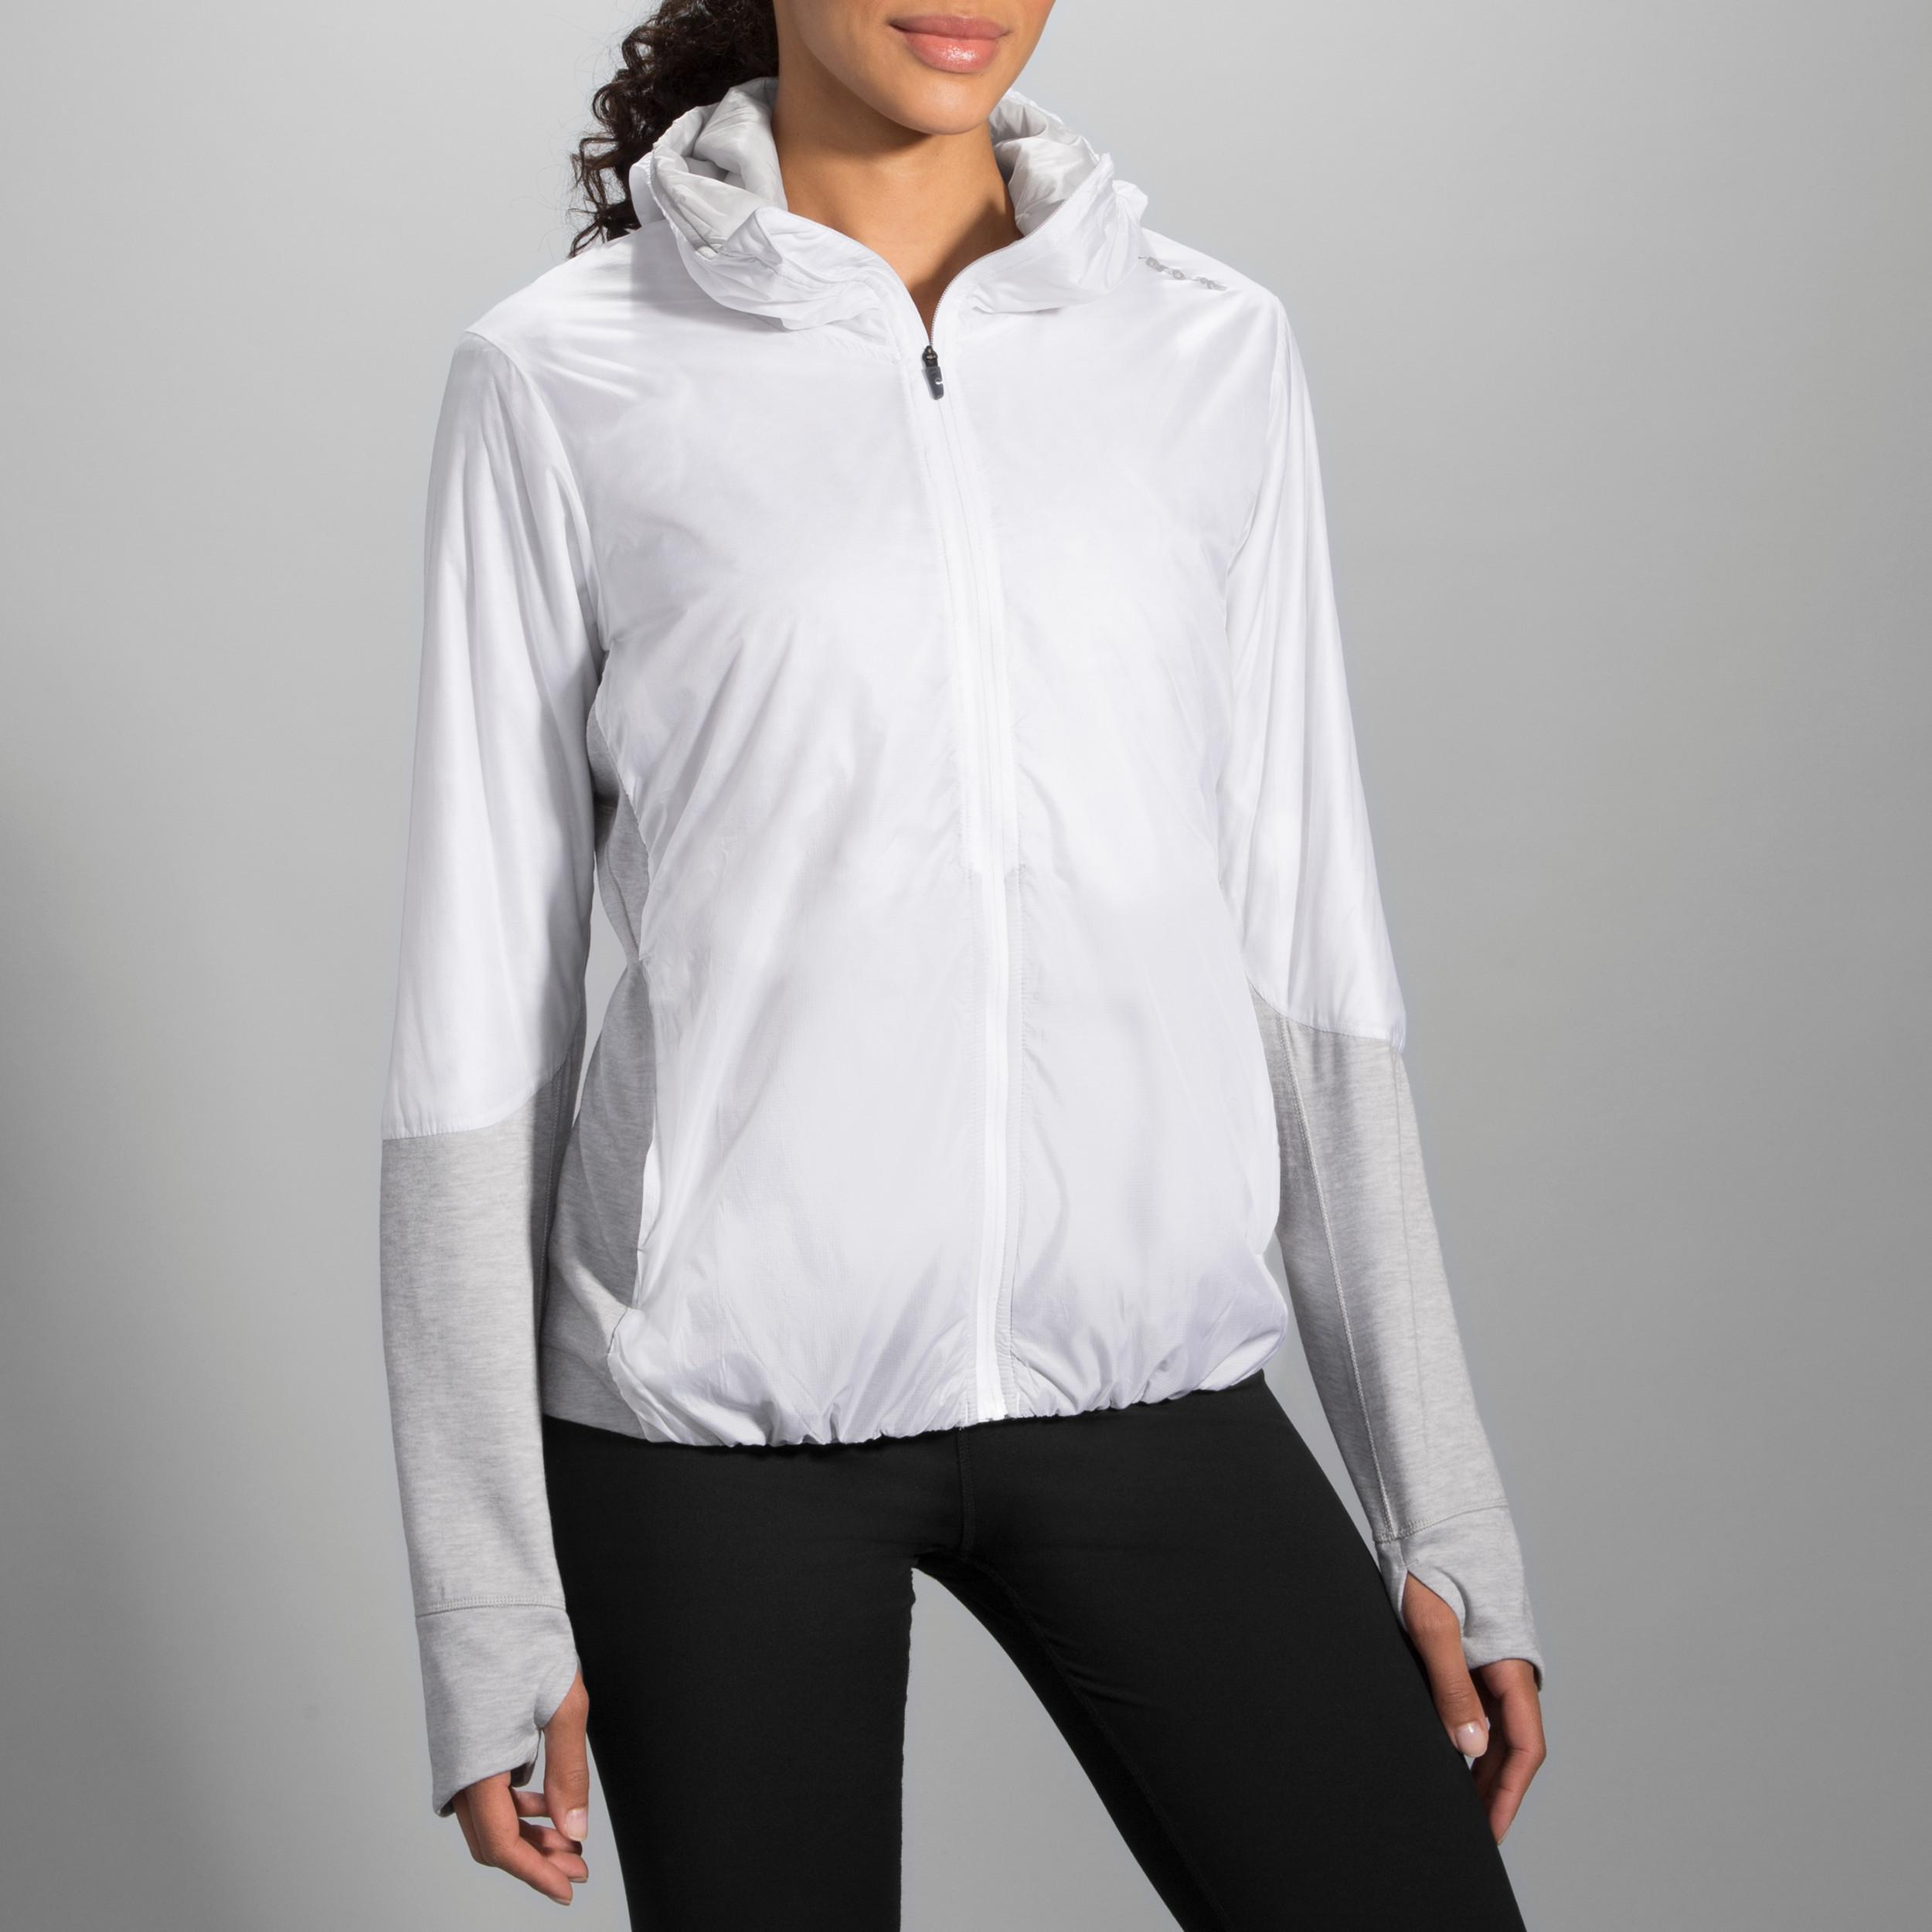 221139_128_mf_lsd_thermal_jacket